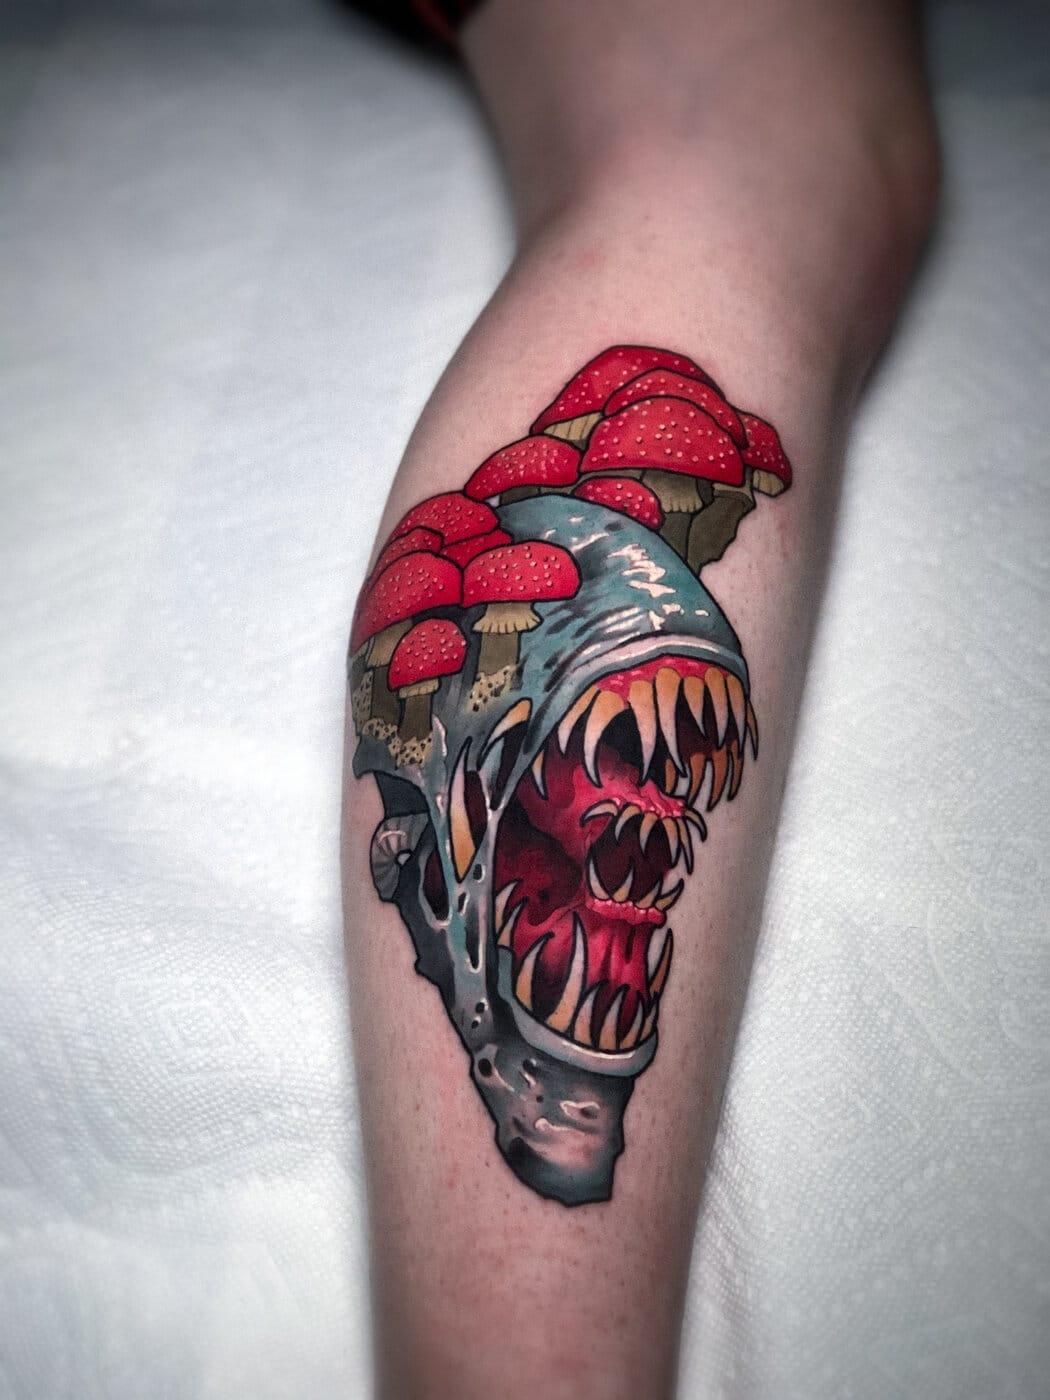 igor-puente-tattoo-artist-alien